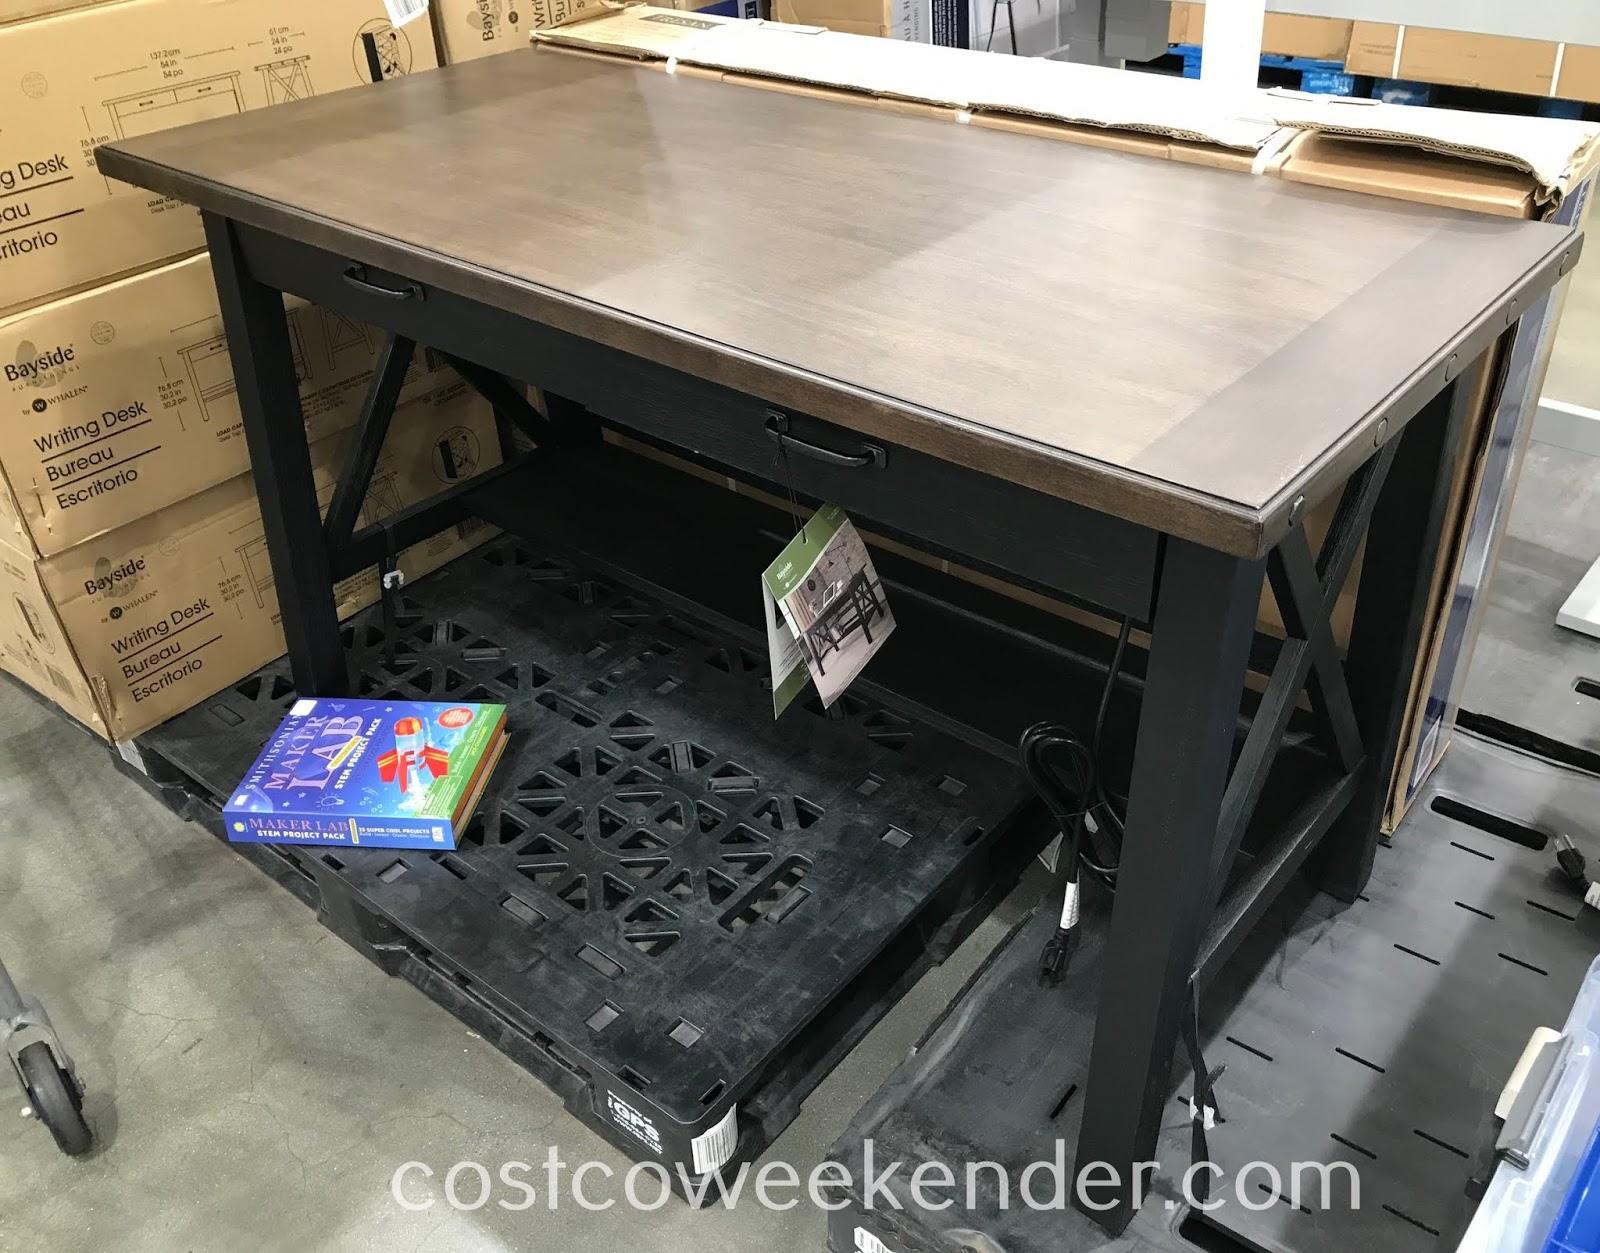 Bayside Furnishings by Whalen Writing Desk  Costco Weekender